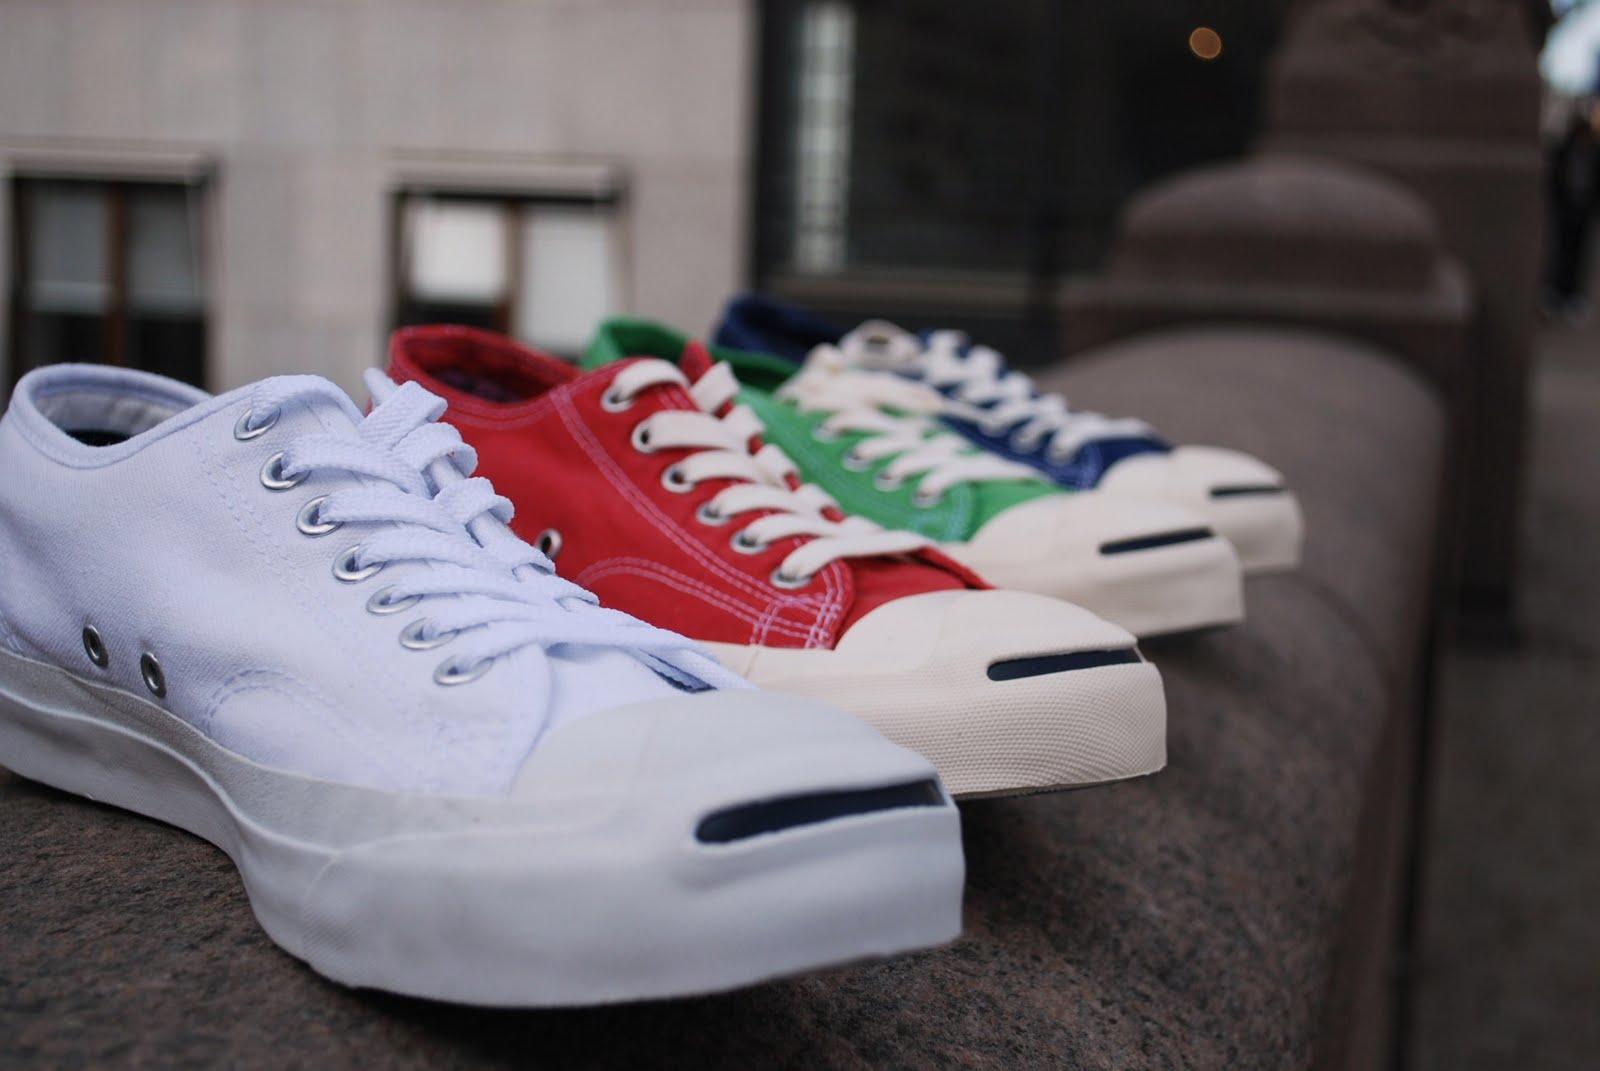 Converse Jack Purcell CP OX. 79 €   799 Sek · Converse Jack Purcell Garment  Dye ... bfbffe05f9a2